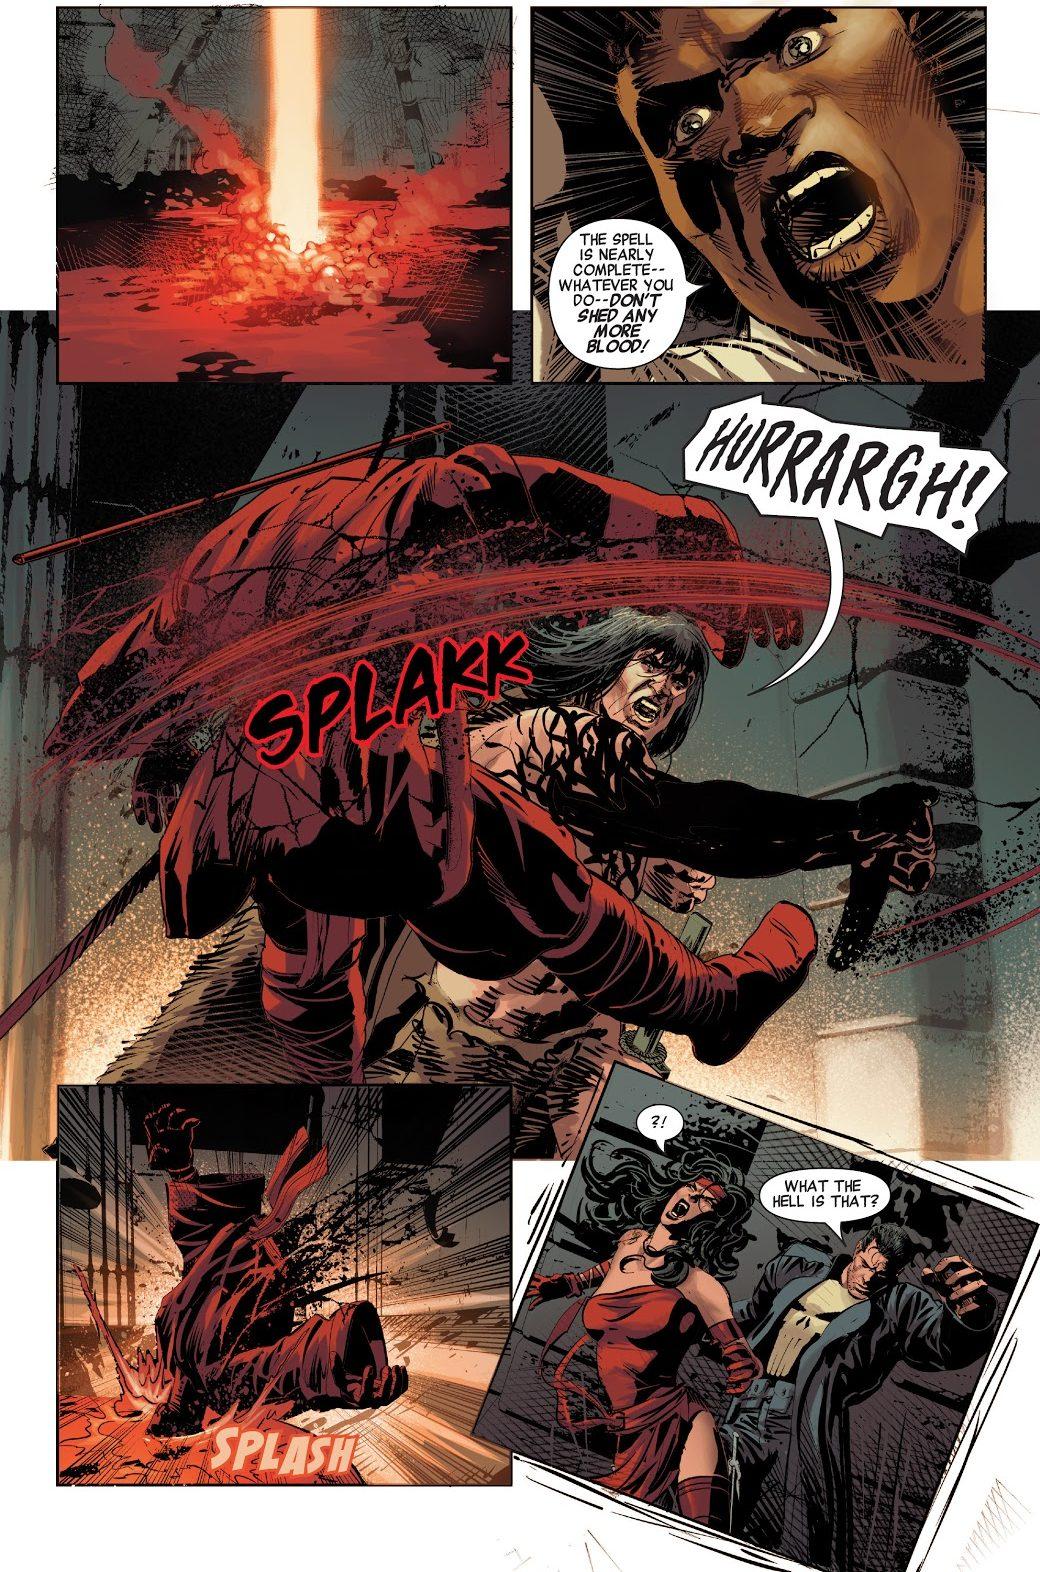 Conan The Barbarian Bonds With A Symbiote